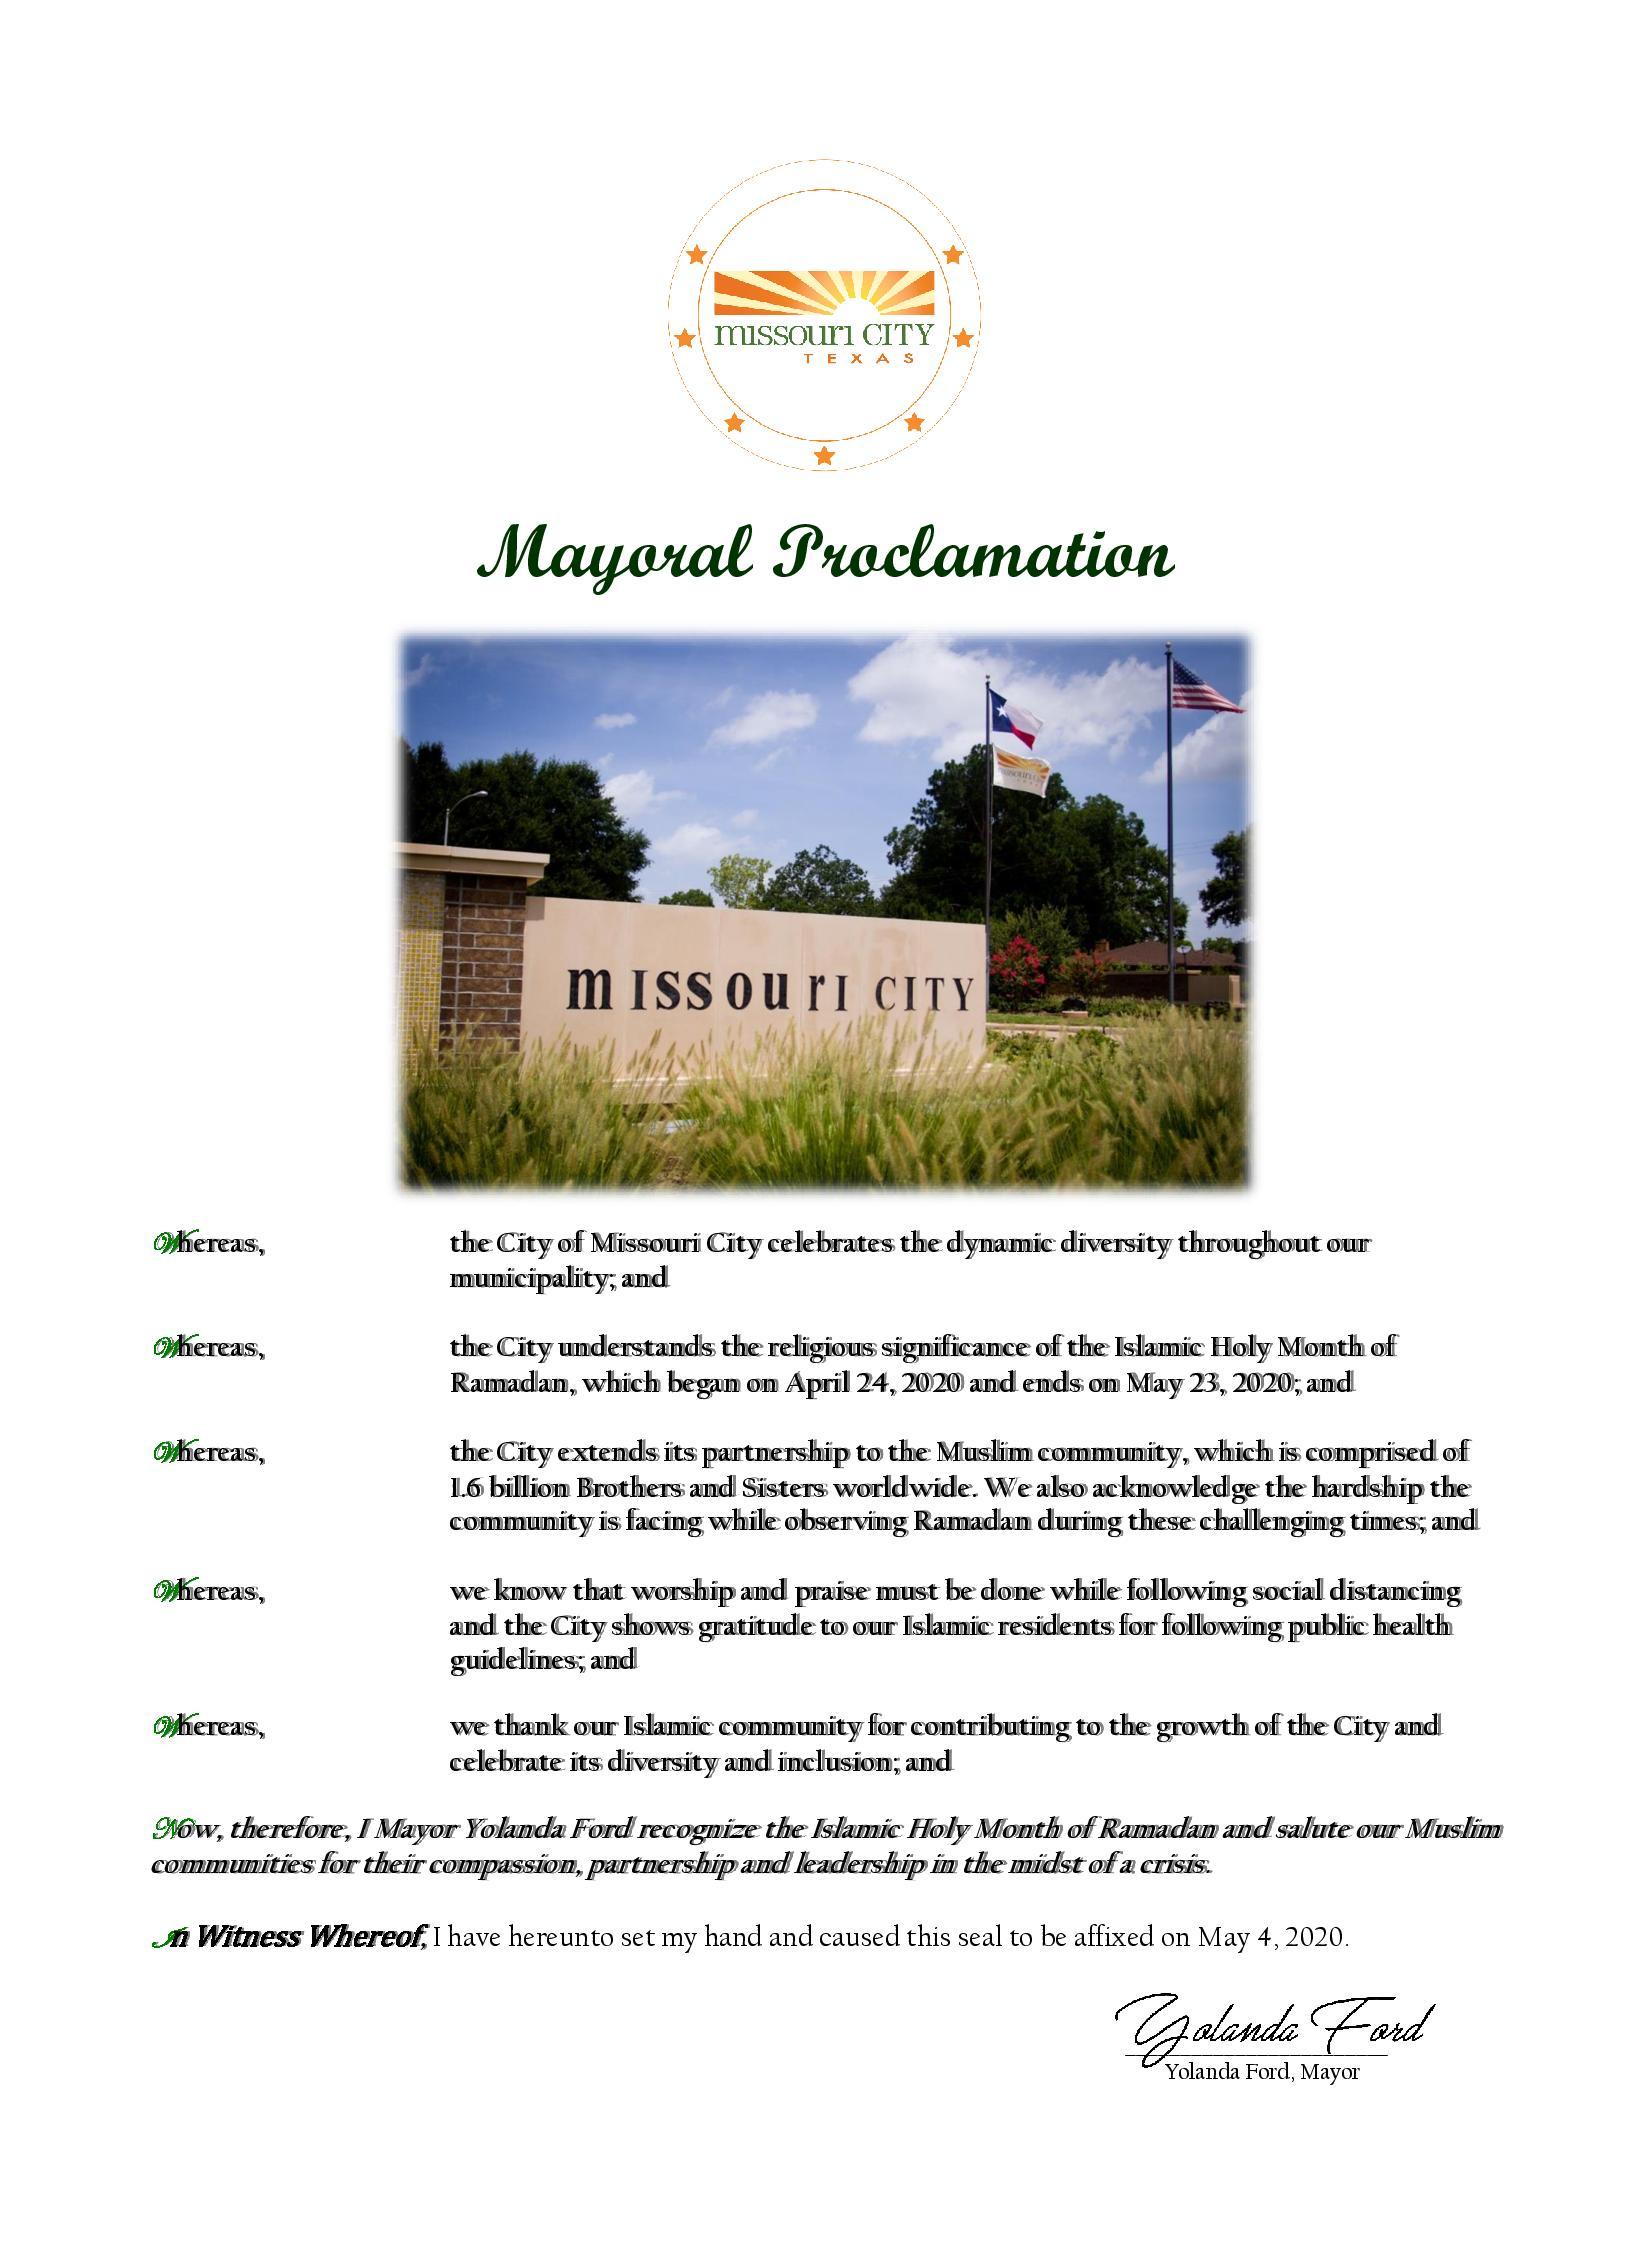 Missouri City Mayoral Proclamation for Ramadan 2020